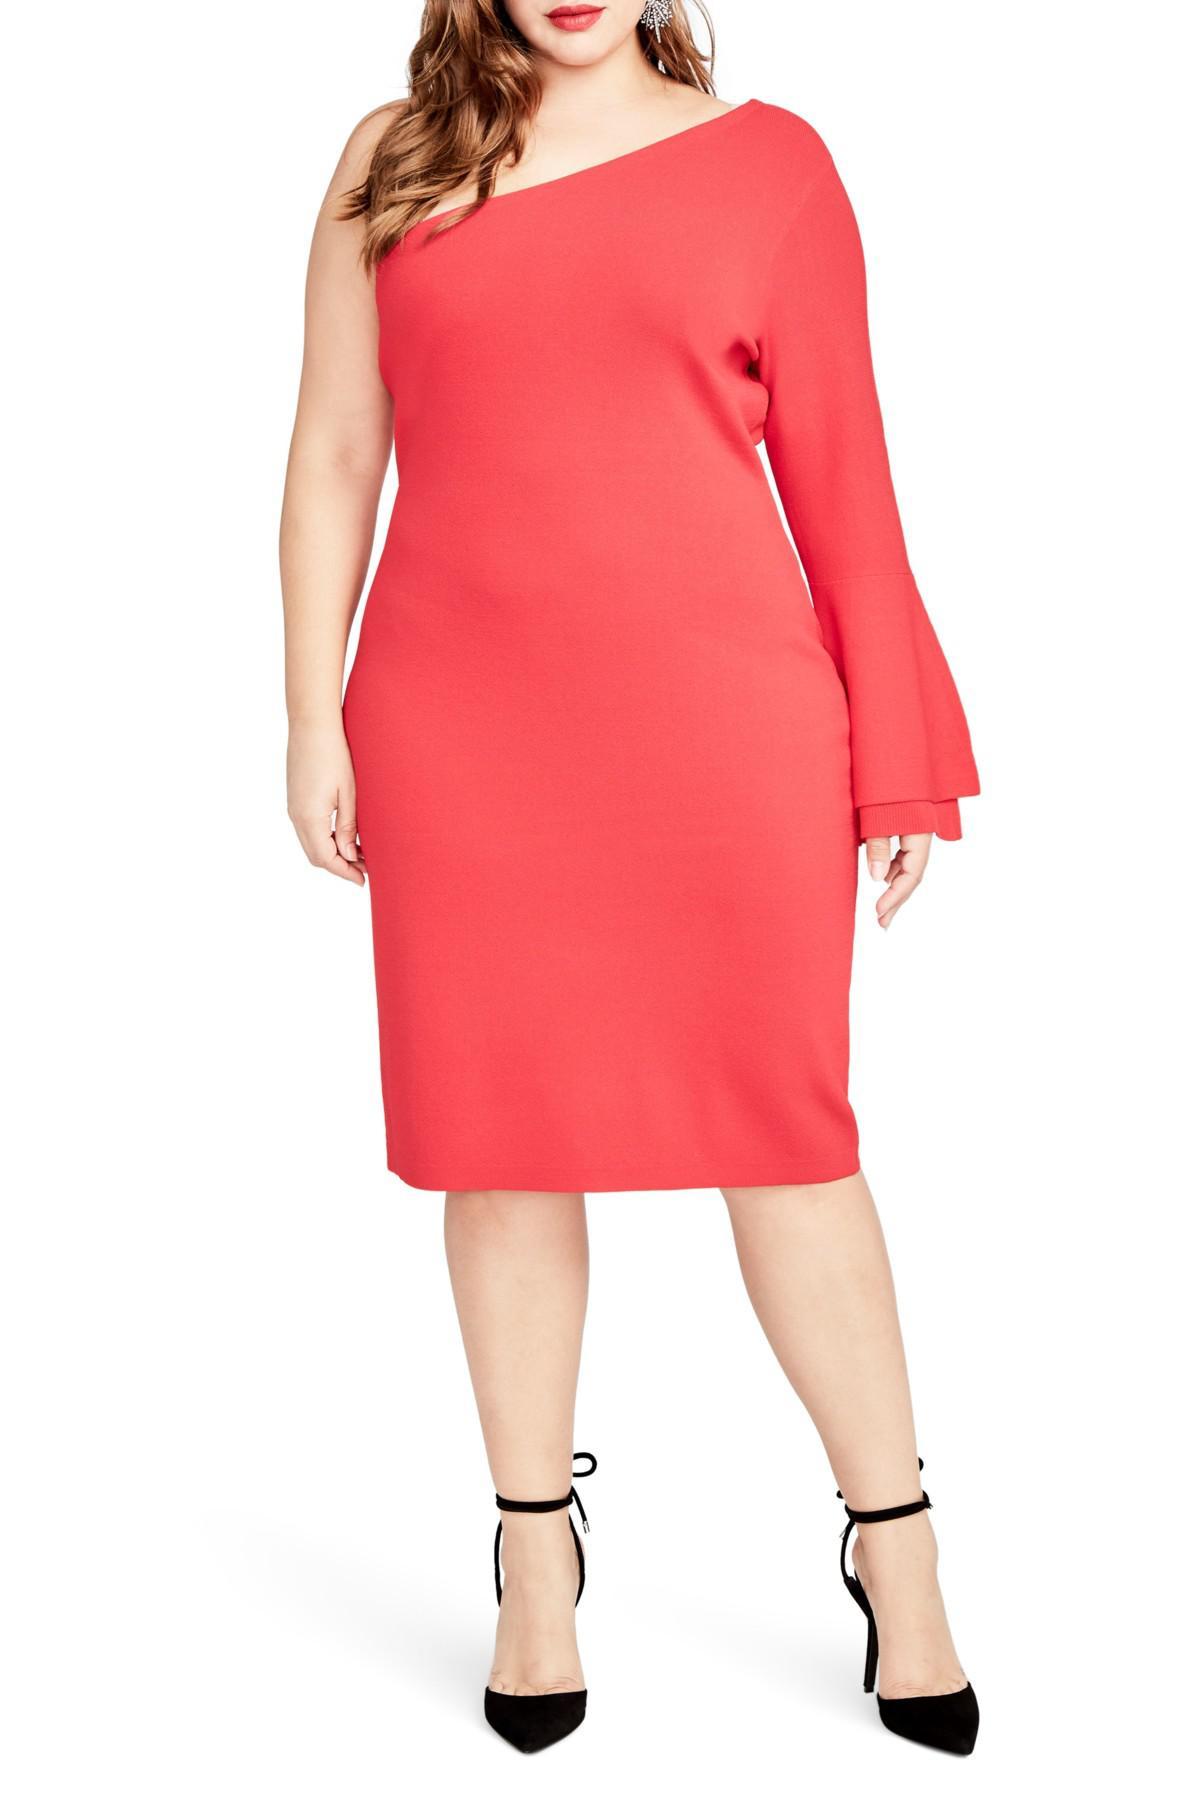 bdf1bce6533a5 RACHEL Rachel Roy. Women s Red One-shoulder Knit Sheath Dress (plus Size)